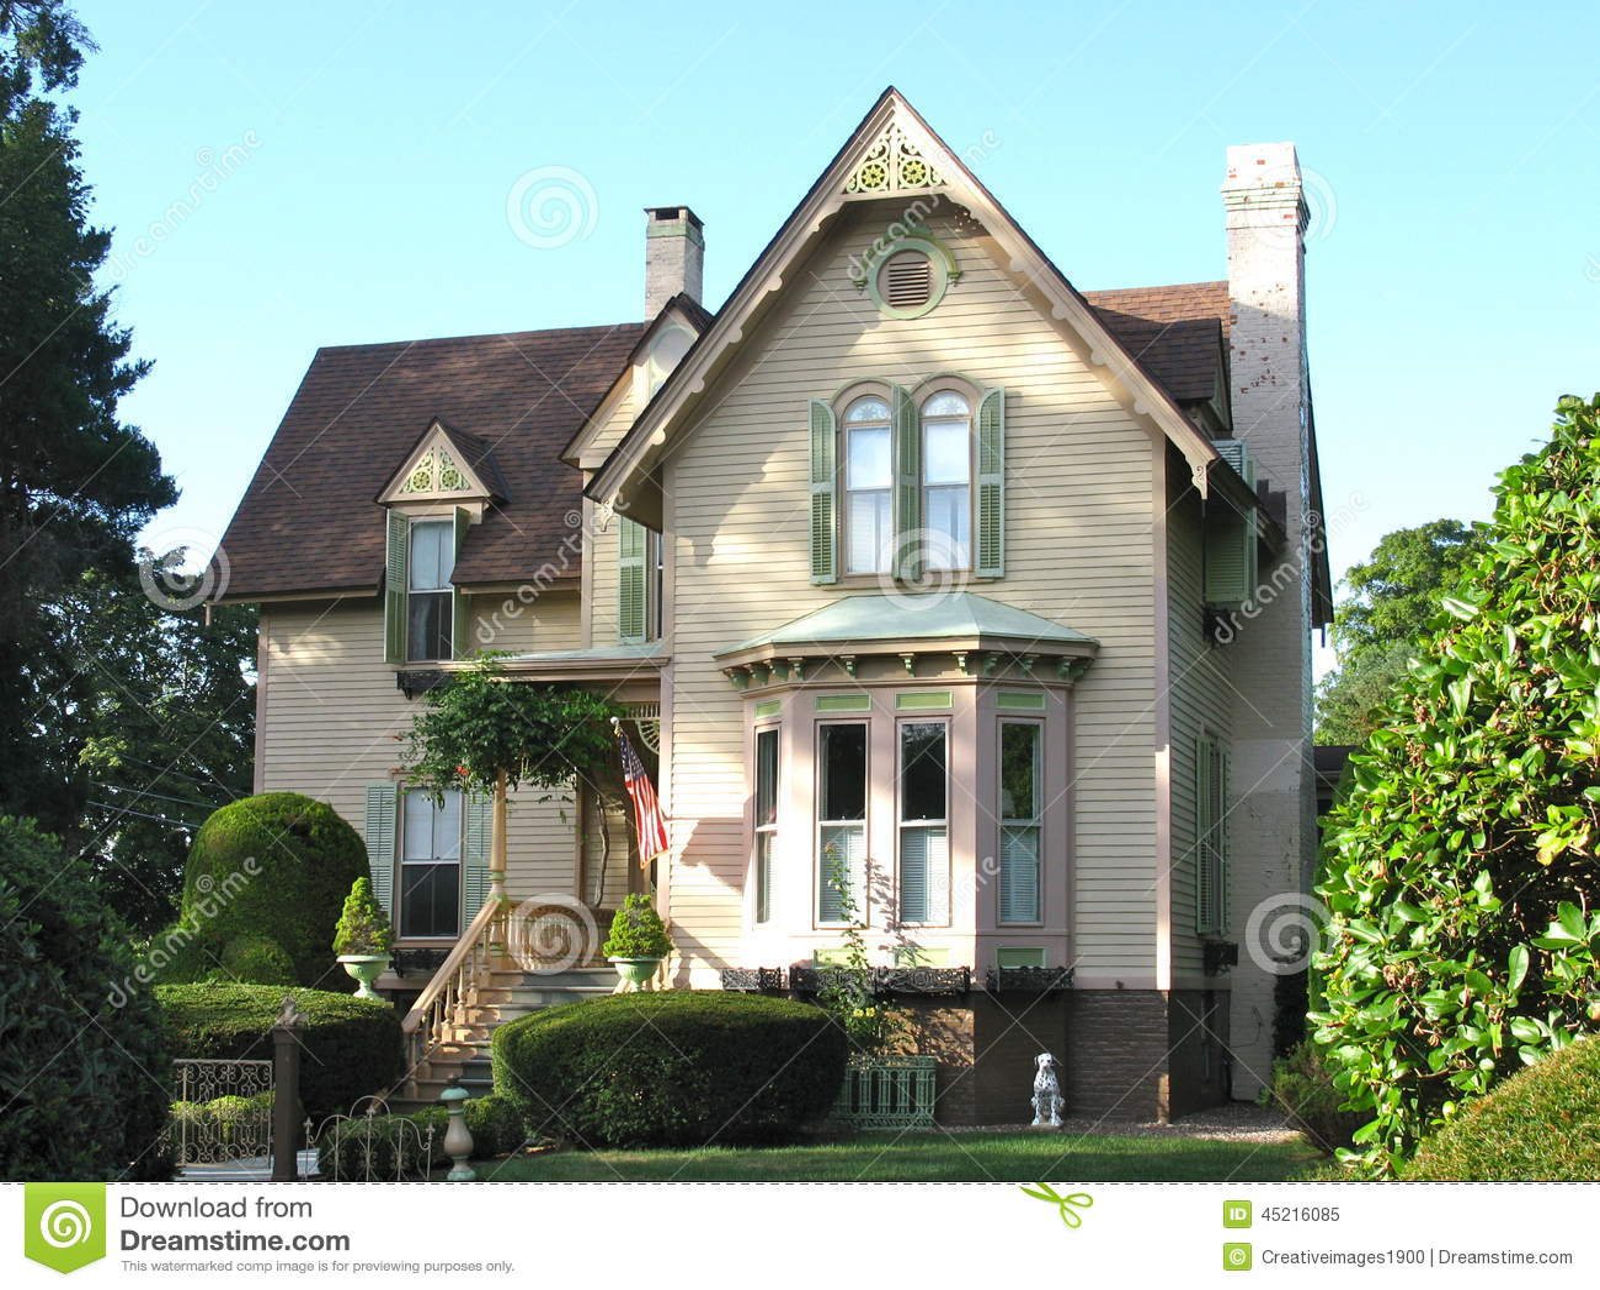 une maison victorienne image stock image du herbe buissons 45216085. Black Bedroom Furniture Sets. Home Design Ideas